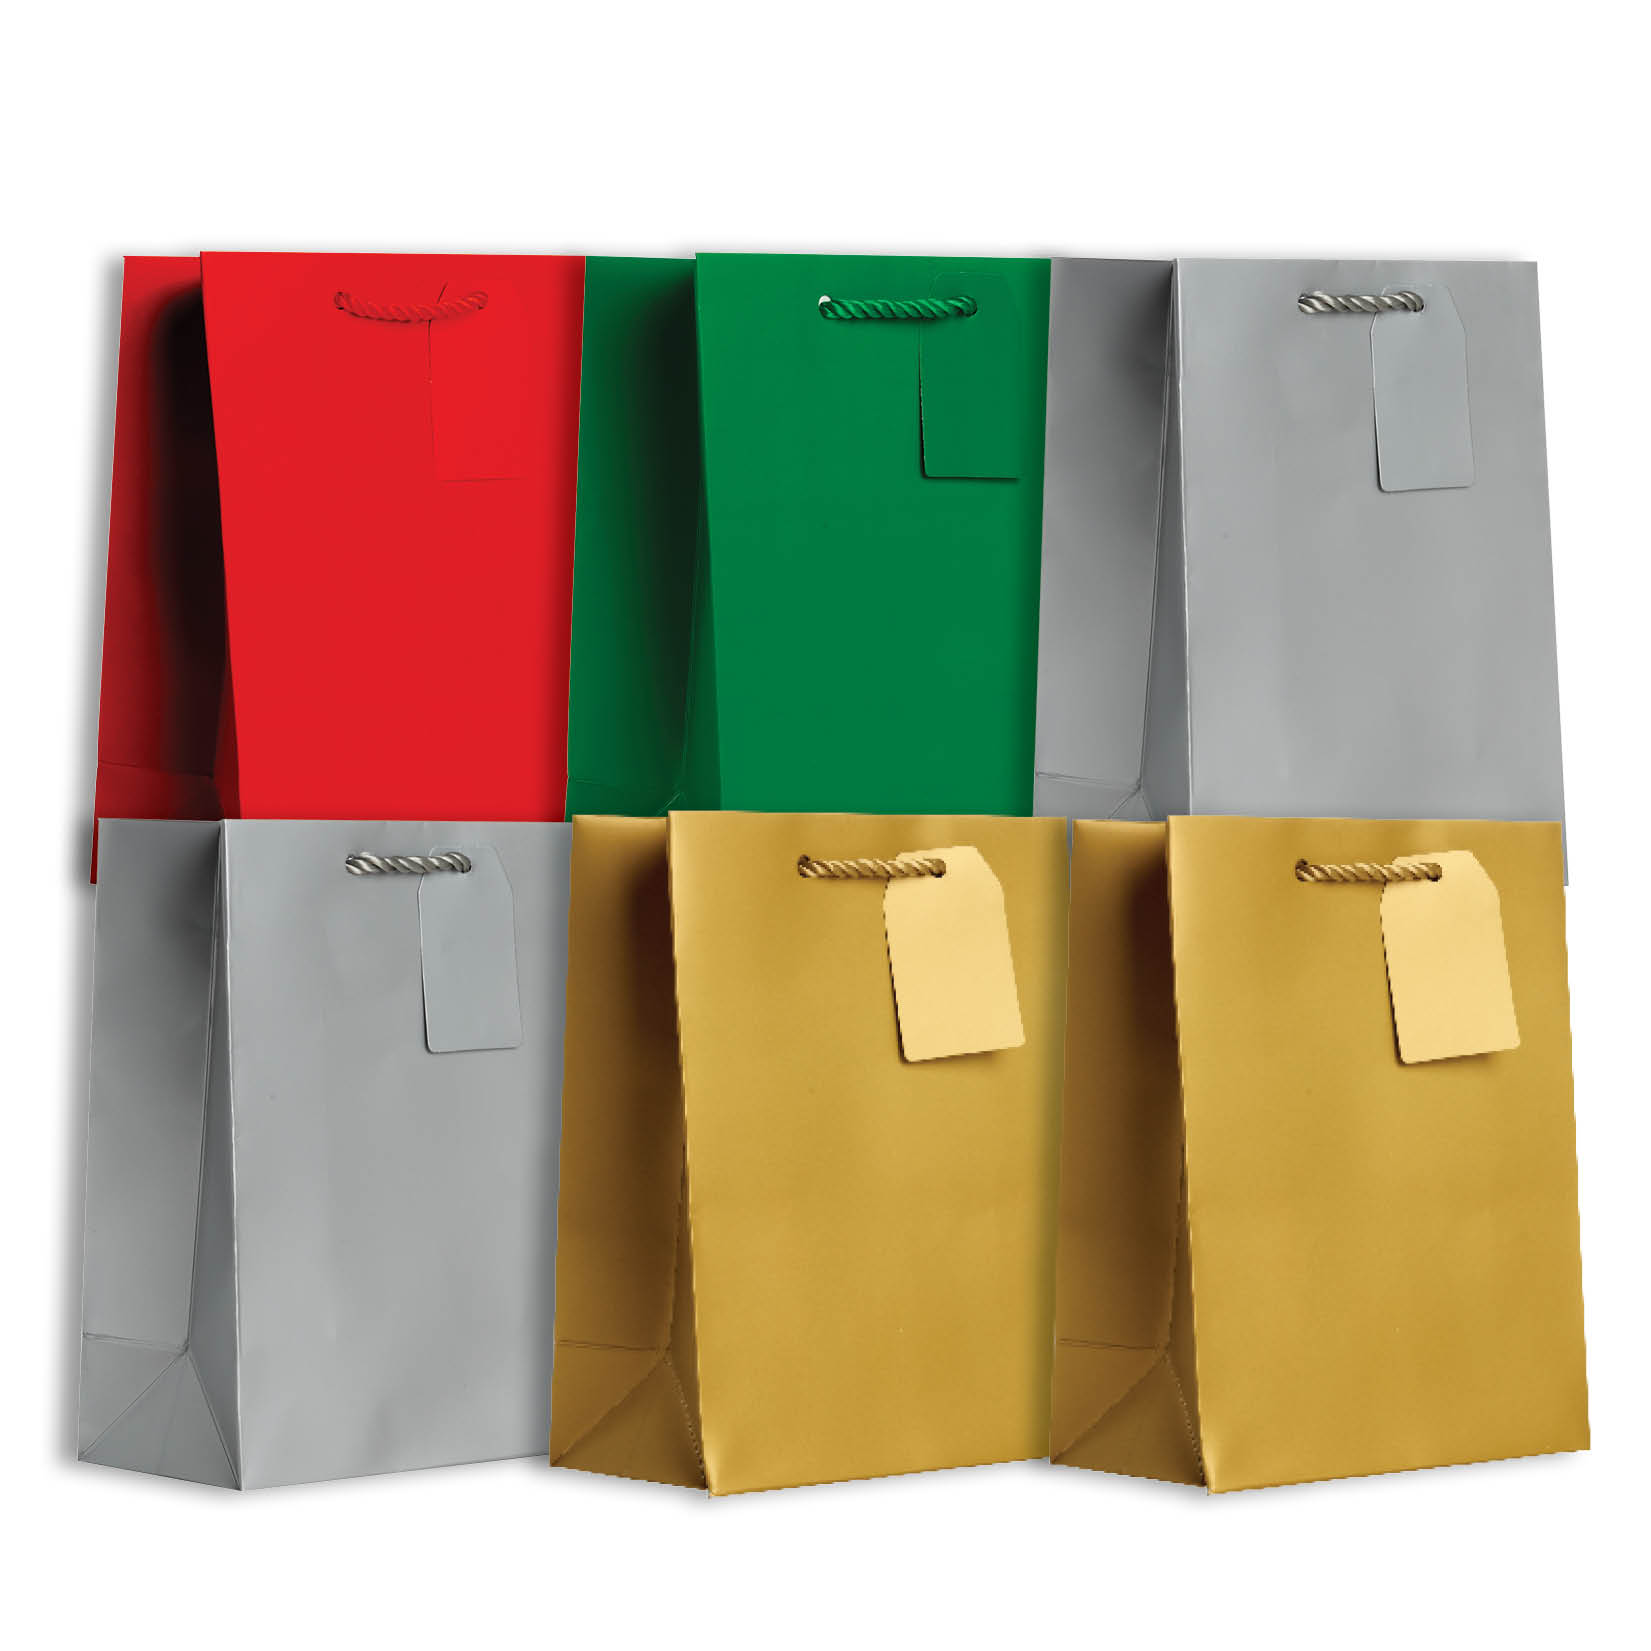 Jillson & Roberts Solid Color Matte Medium Gift Bag Assortment, Christmas (6 Bags)